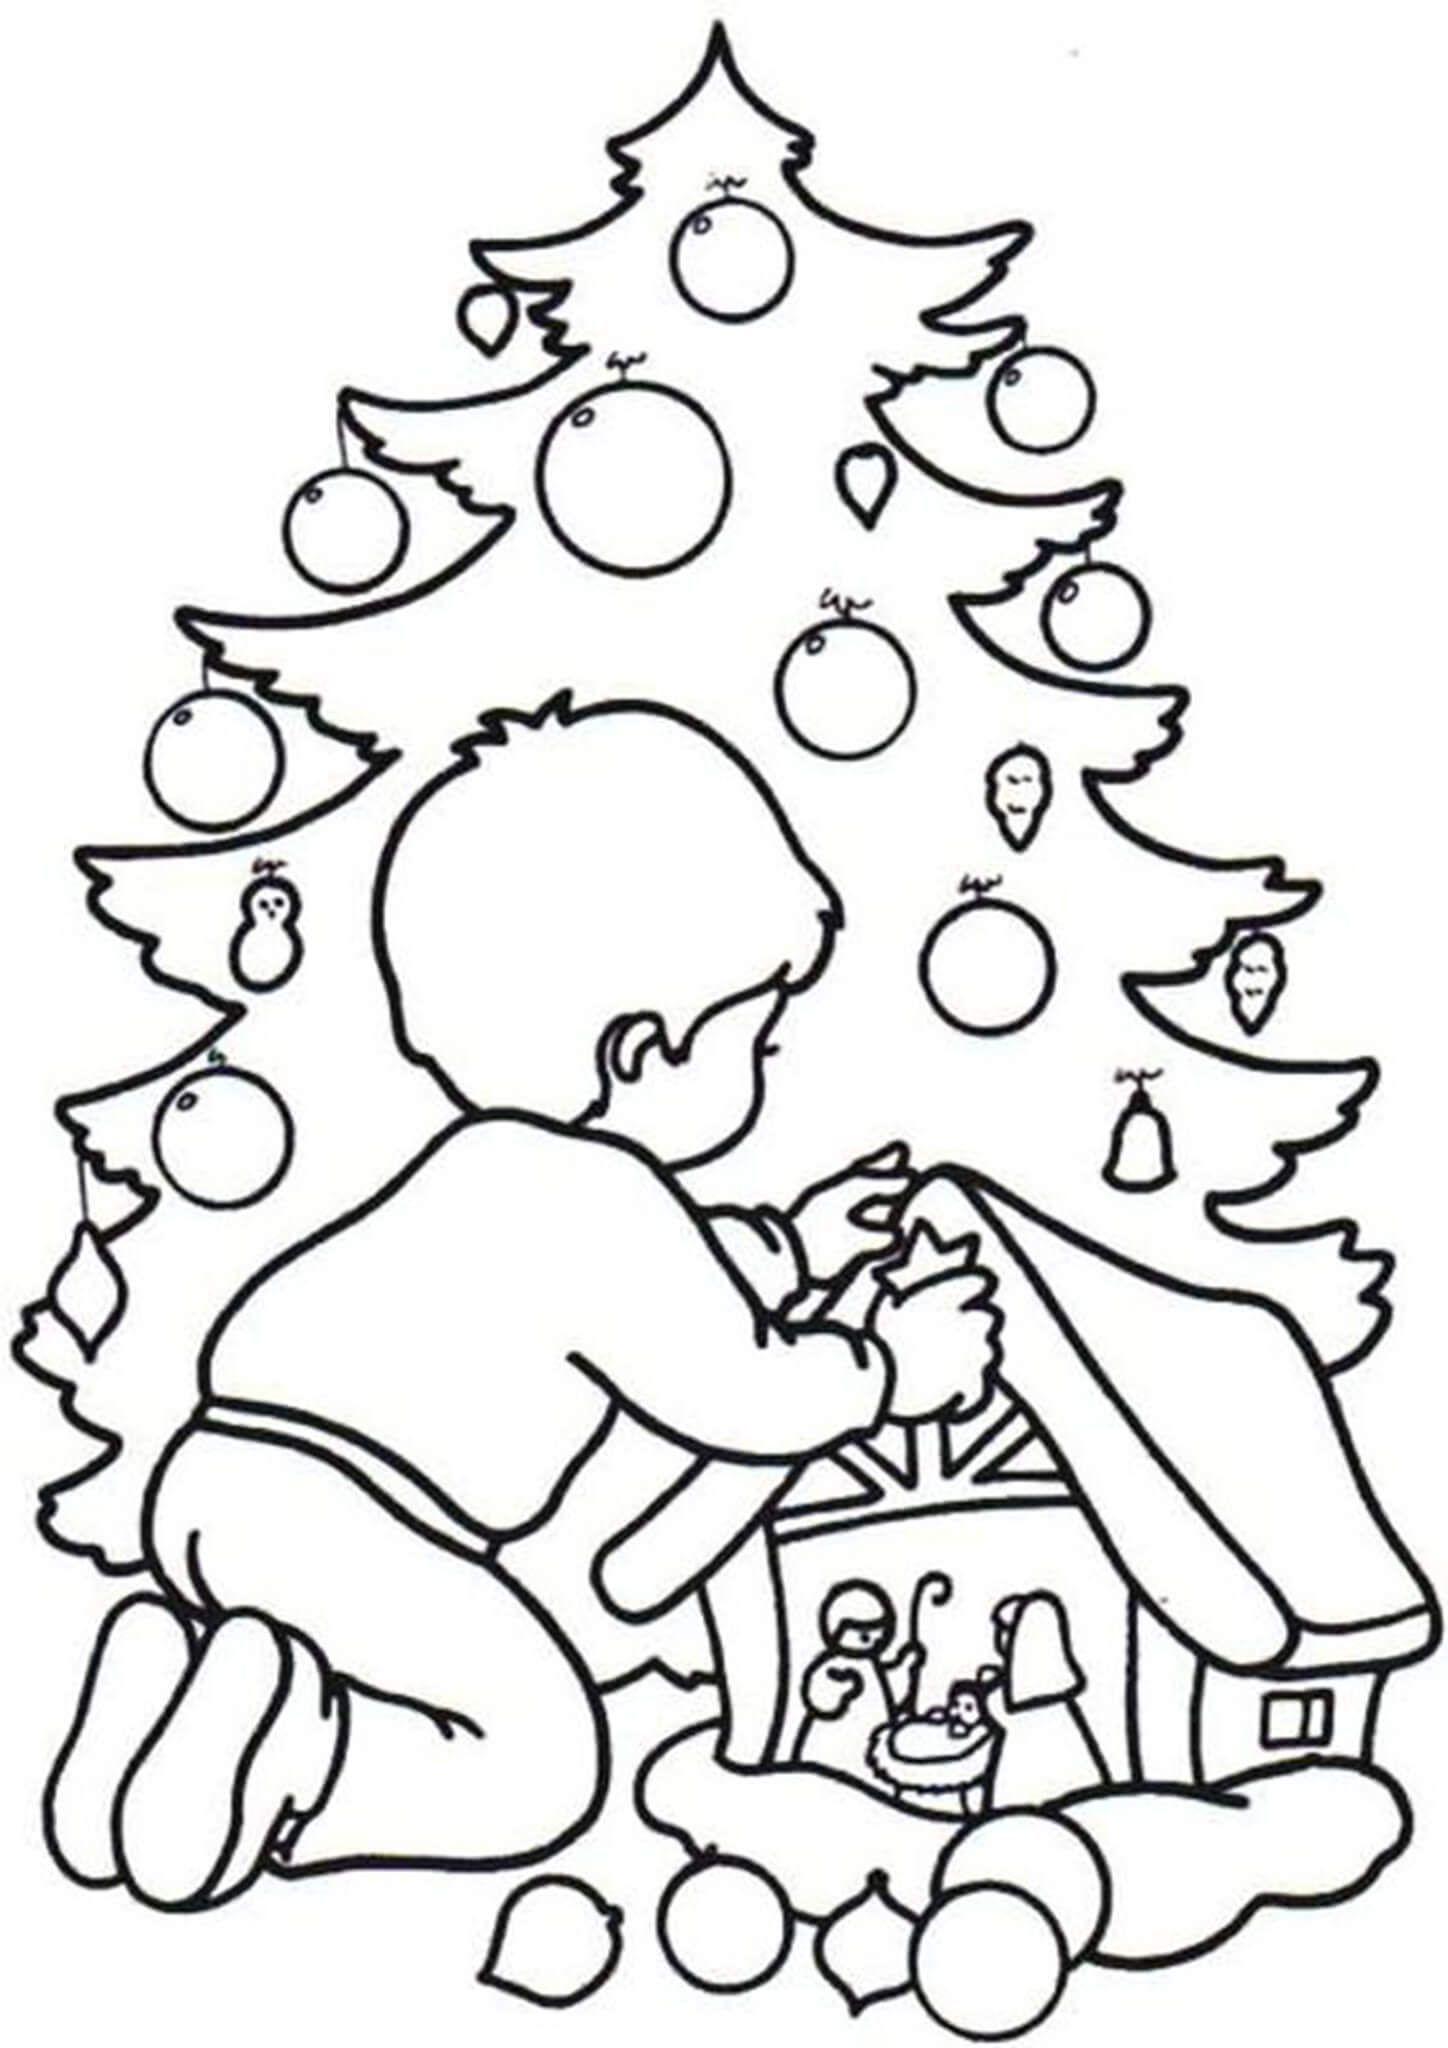 Free Easy To Print Christmas Tree Coloring Pages Christmas Tree Coloring Page Tree Coloring Page Christmas Coloring Books